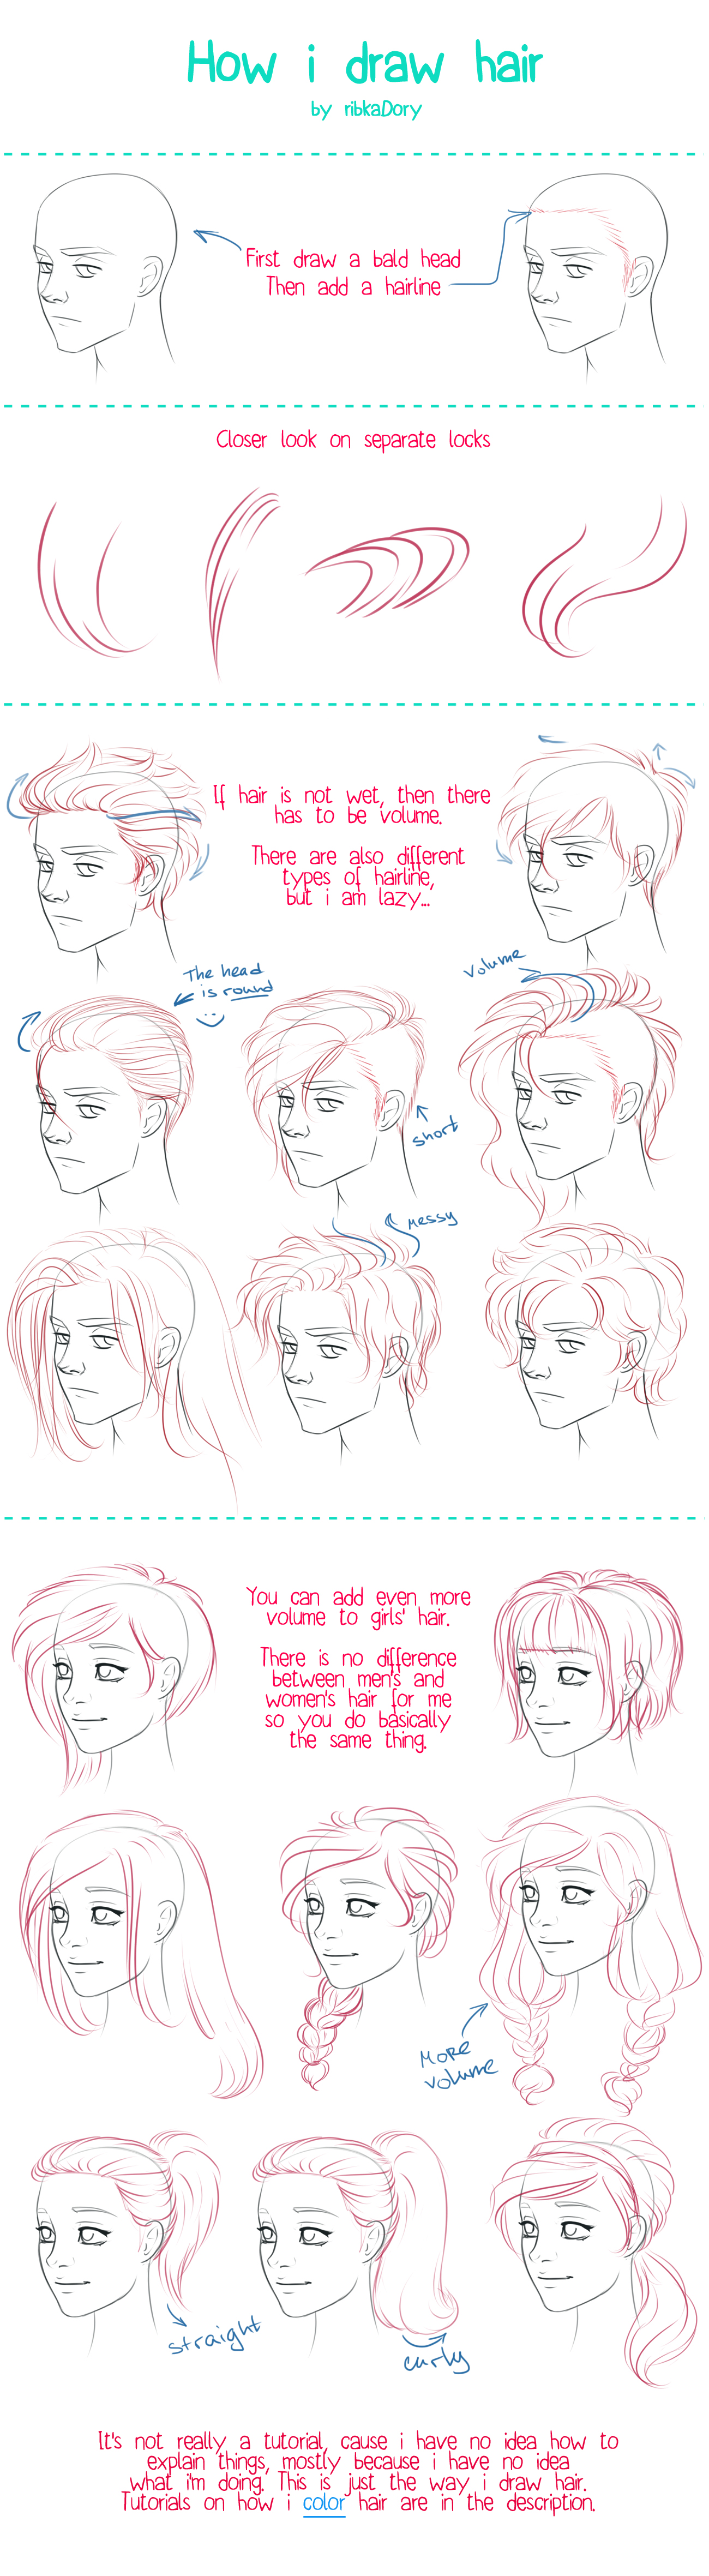 How I Draw Hair